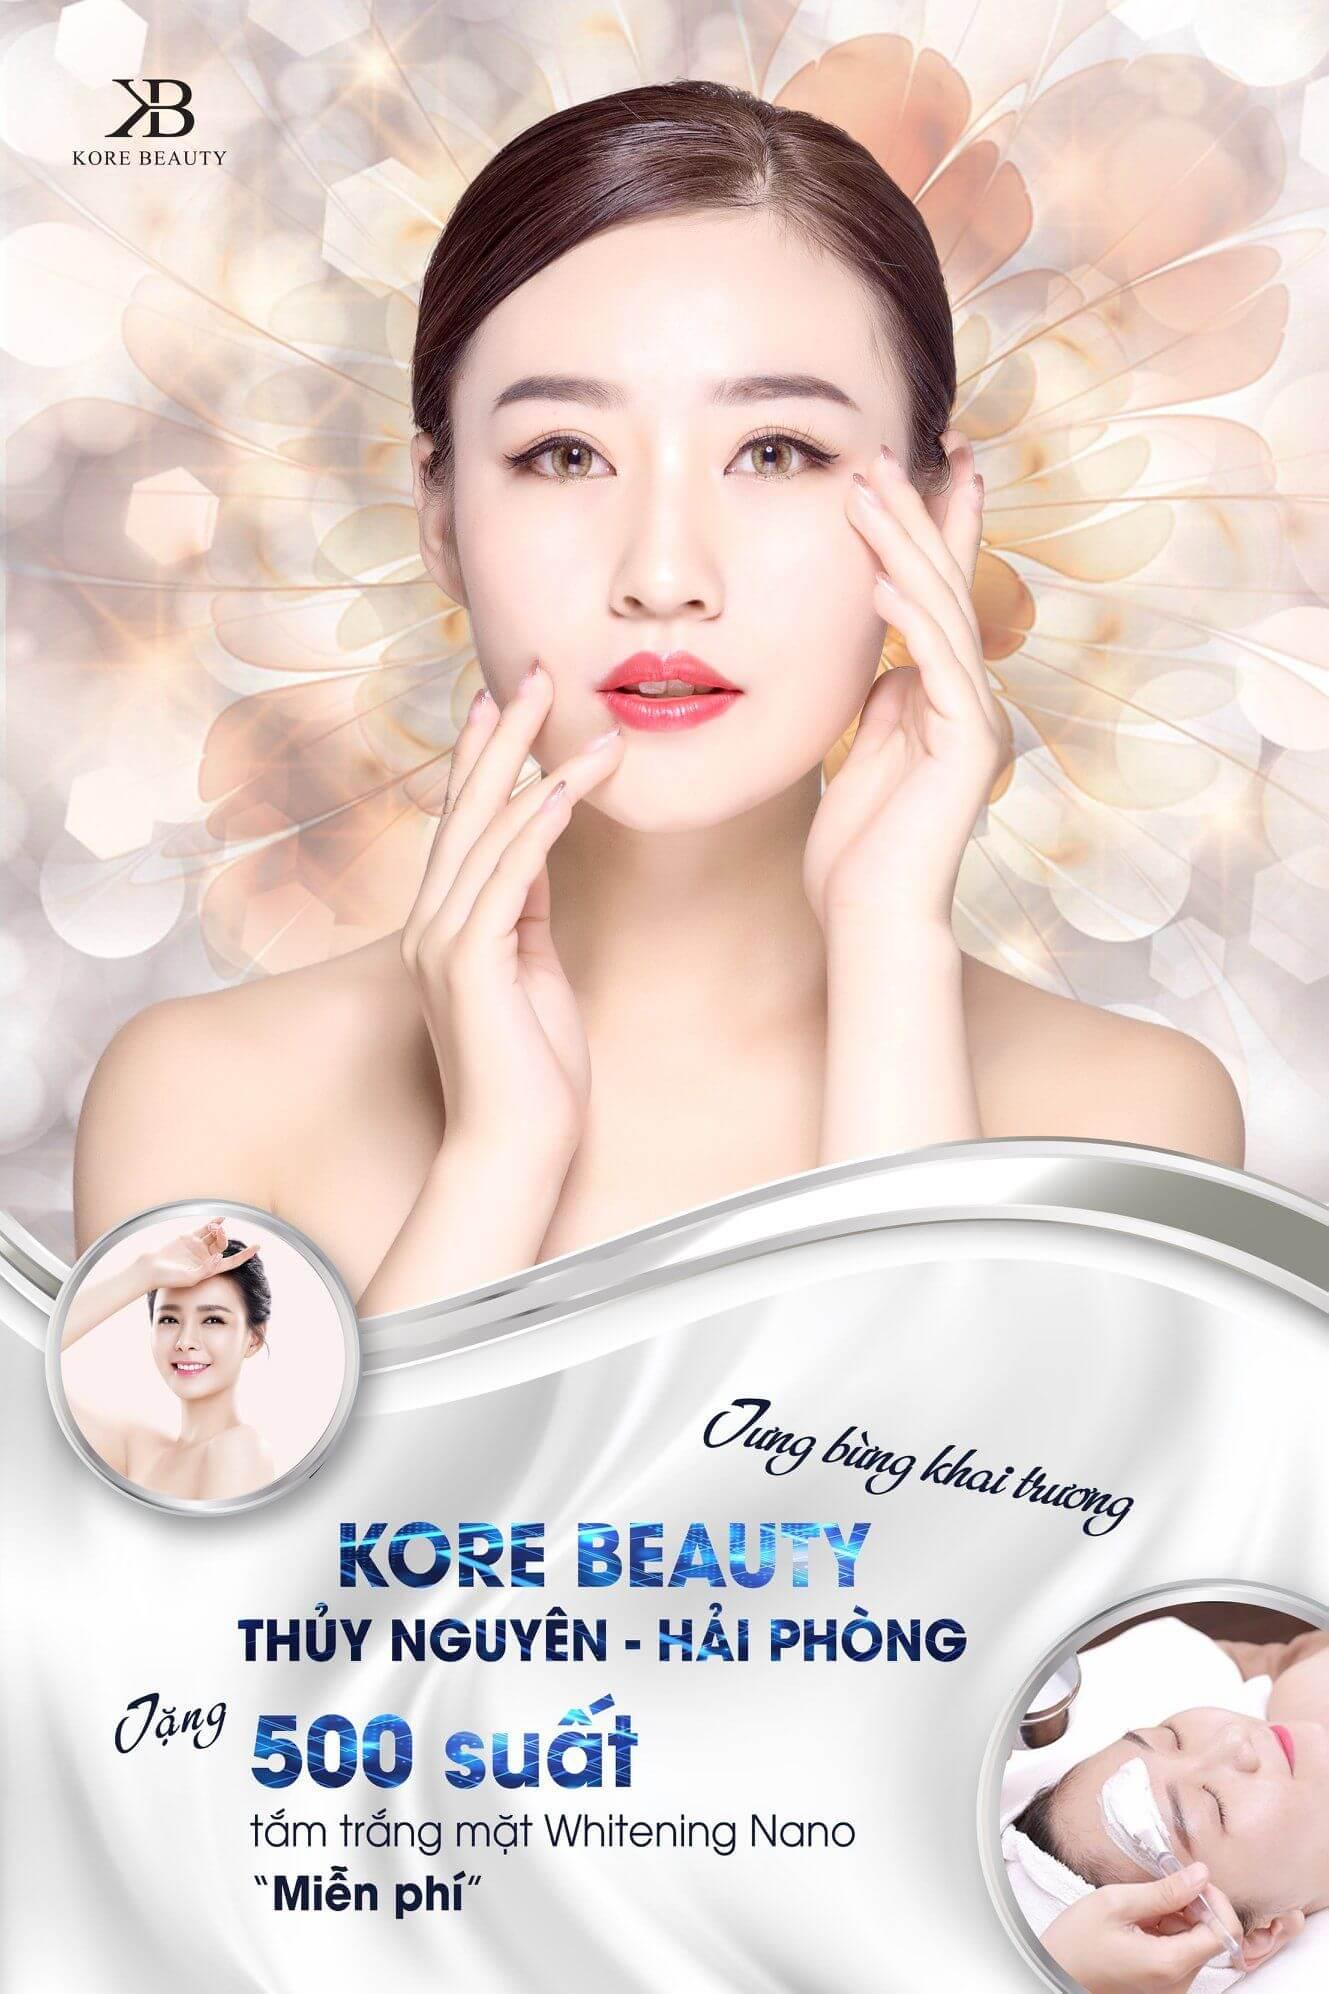 Kore Beauty Spa